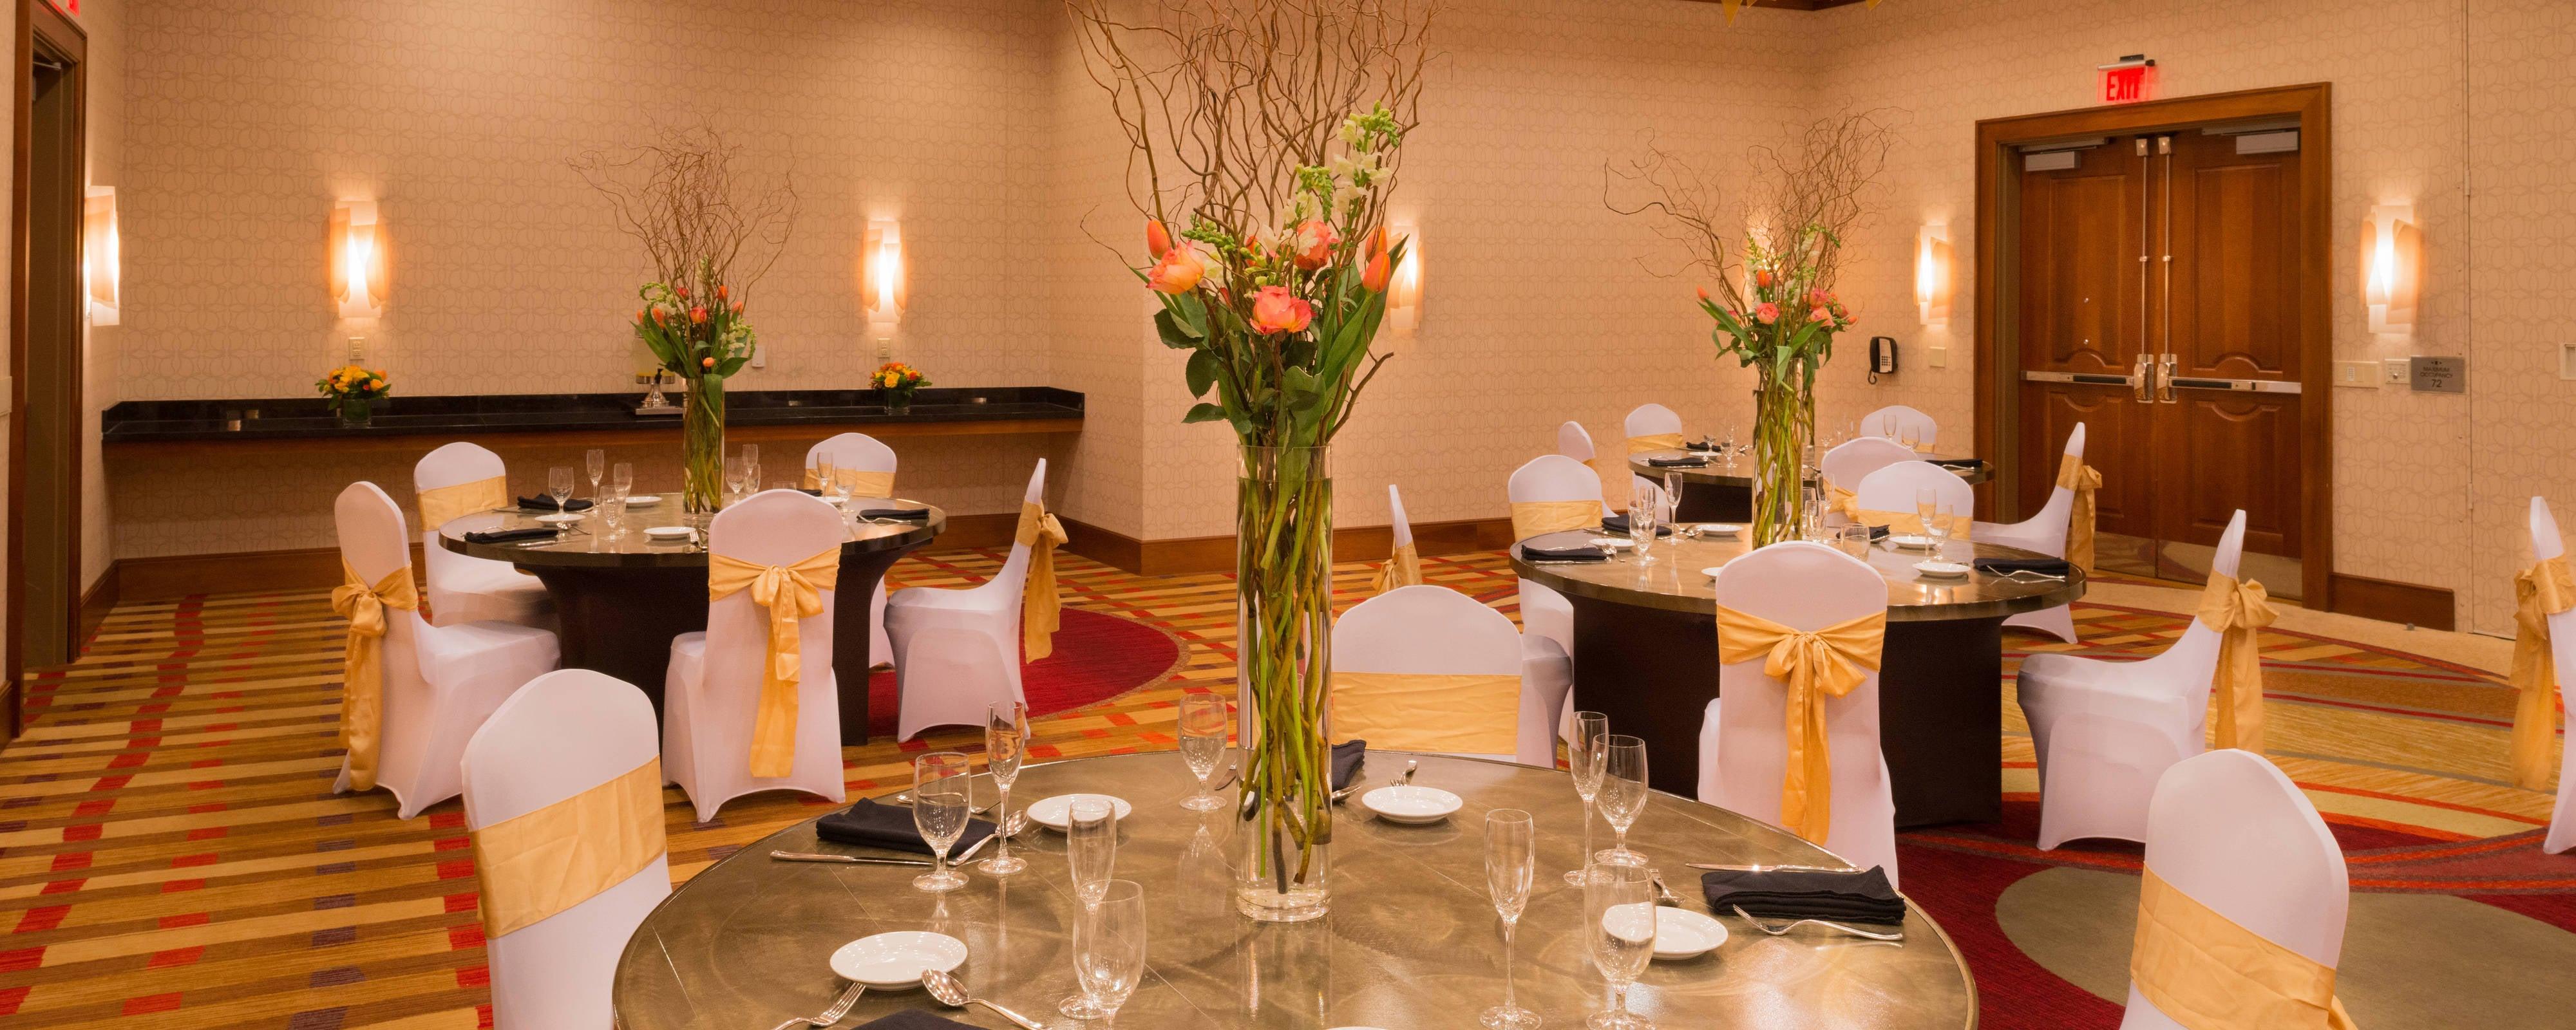 Wedding venues in memphis marriott memphis weddings weddings and occasions ballrooms in memphis junglespirit Choice Image